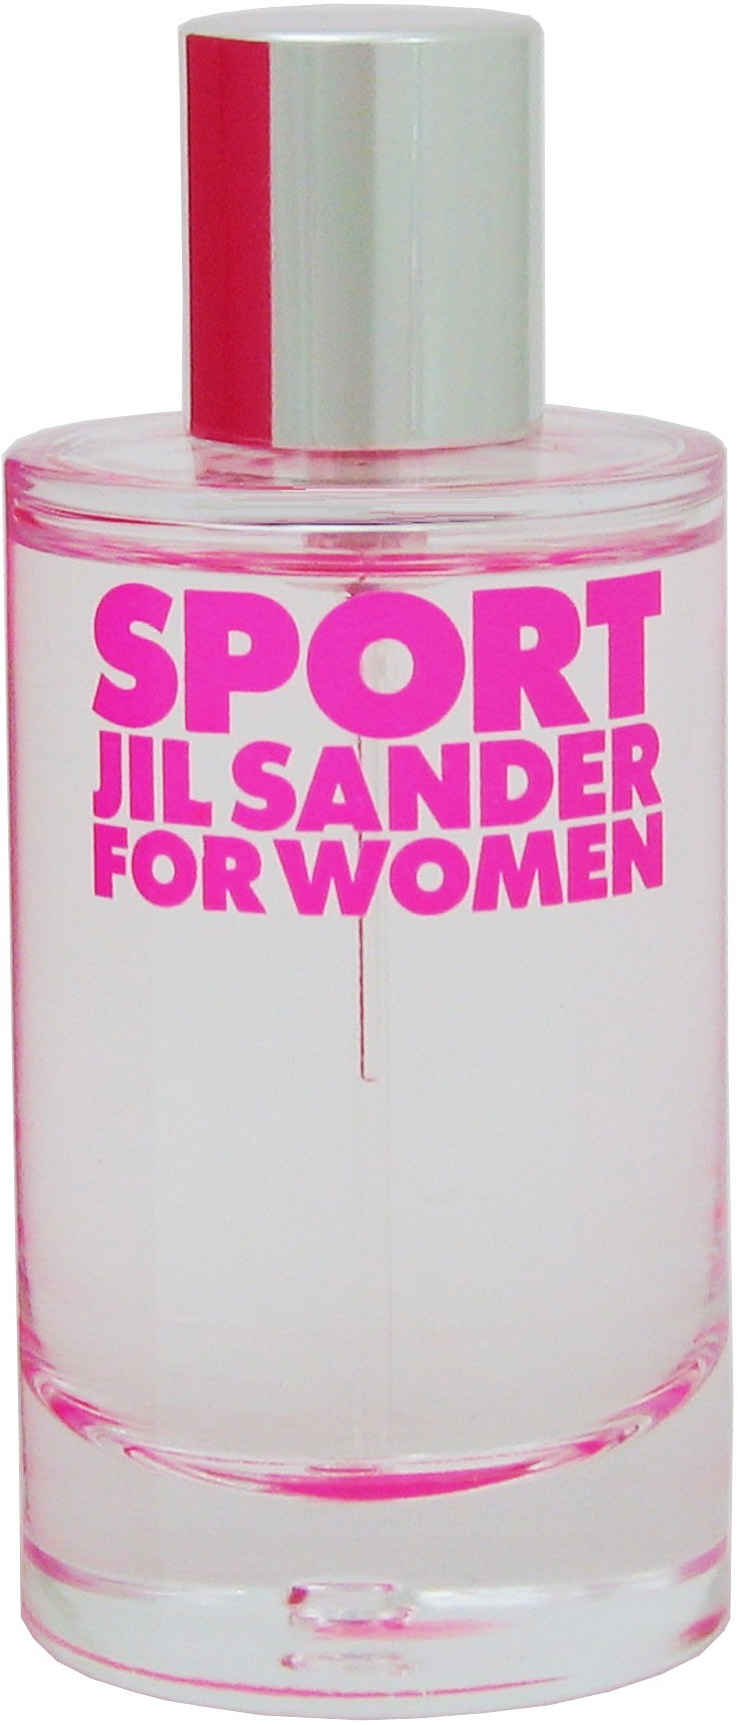 JIL SANDER Eau de Toilette »Sport for Woman«